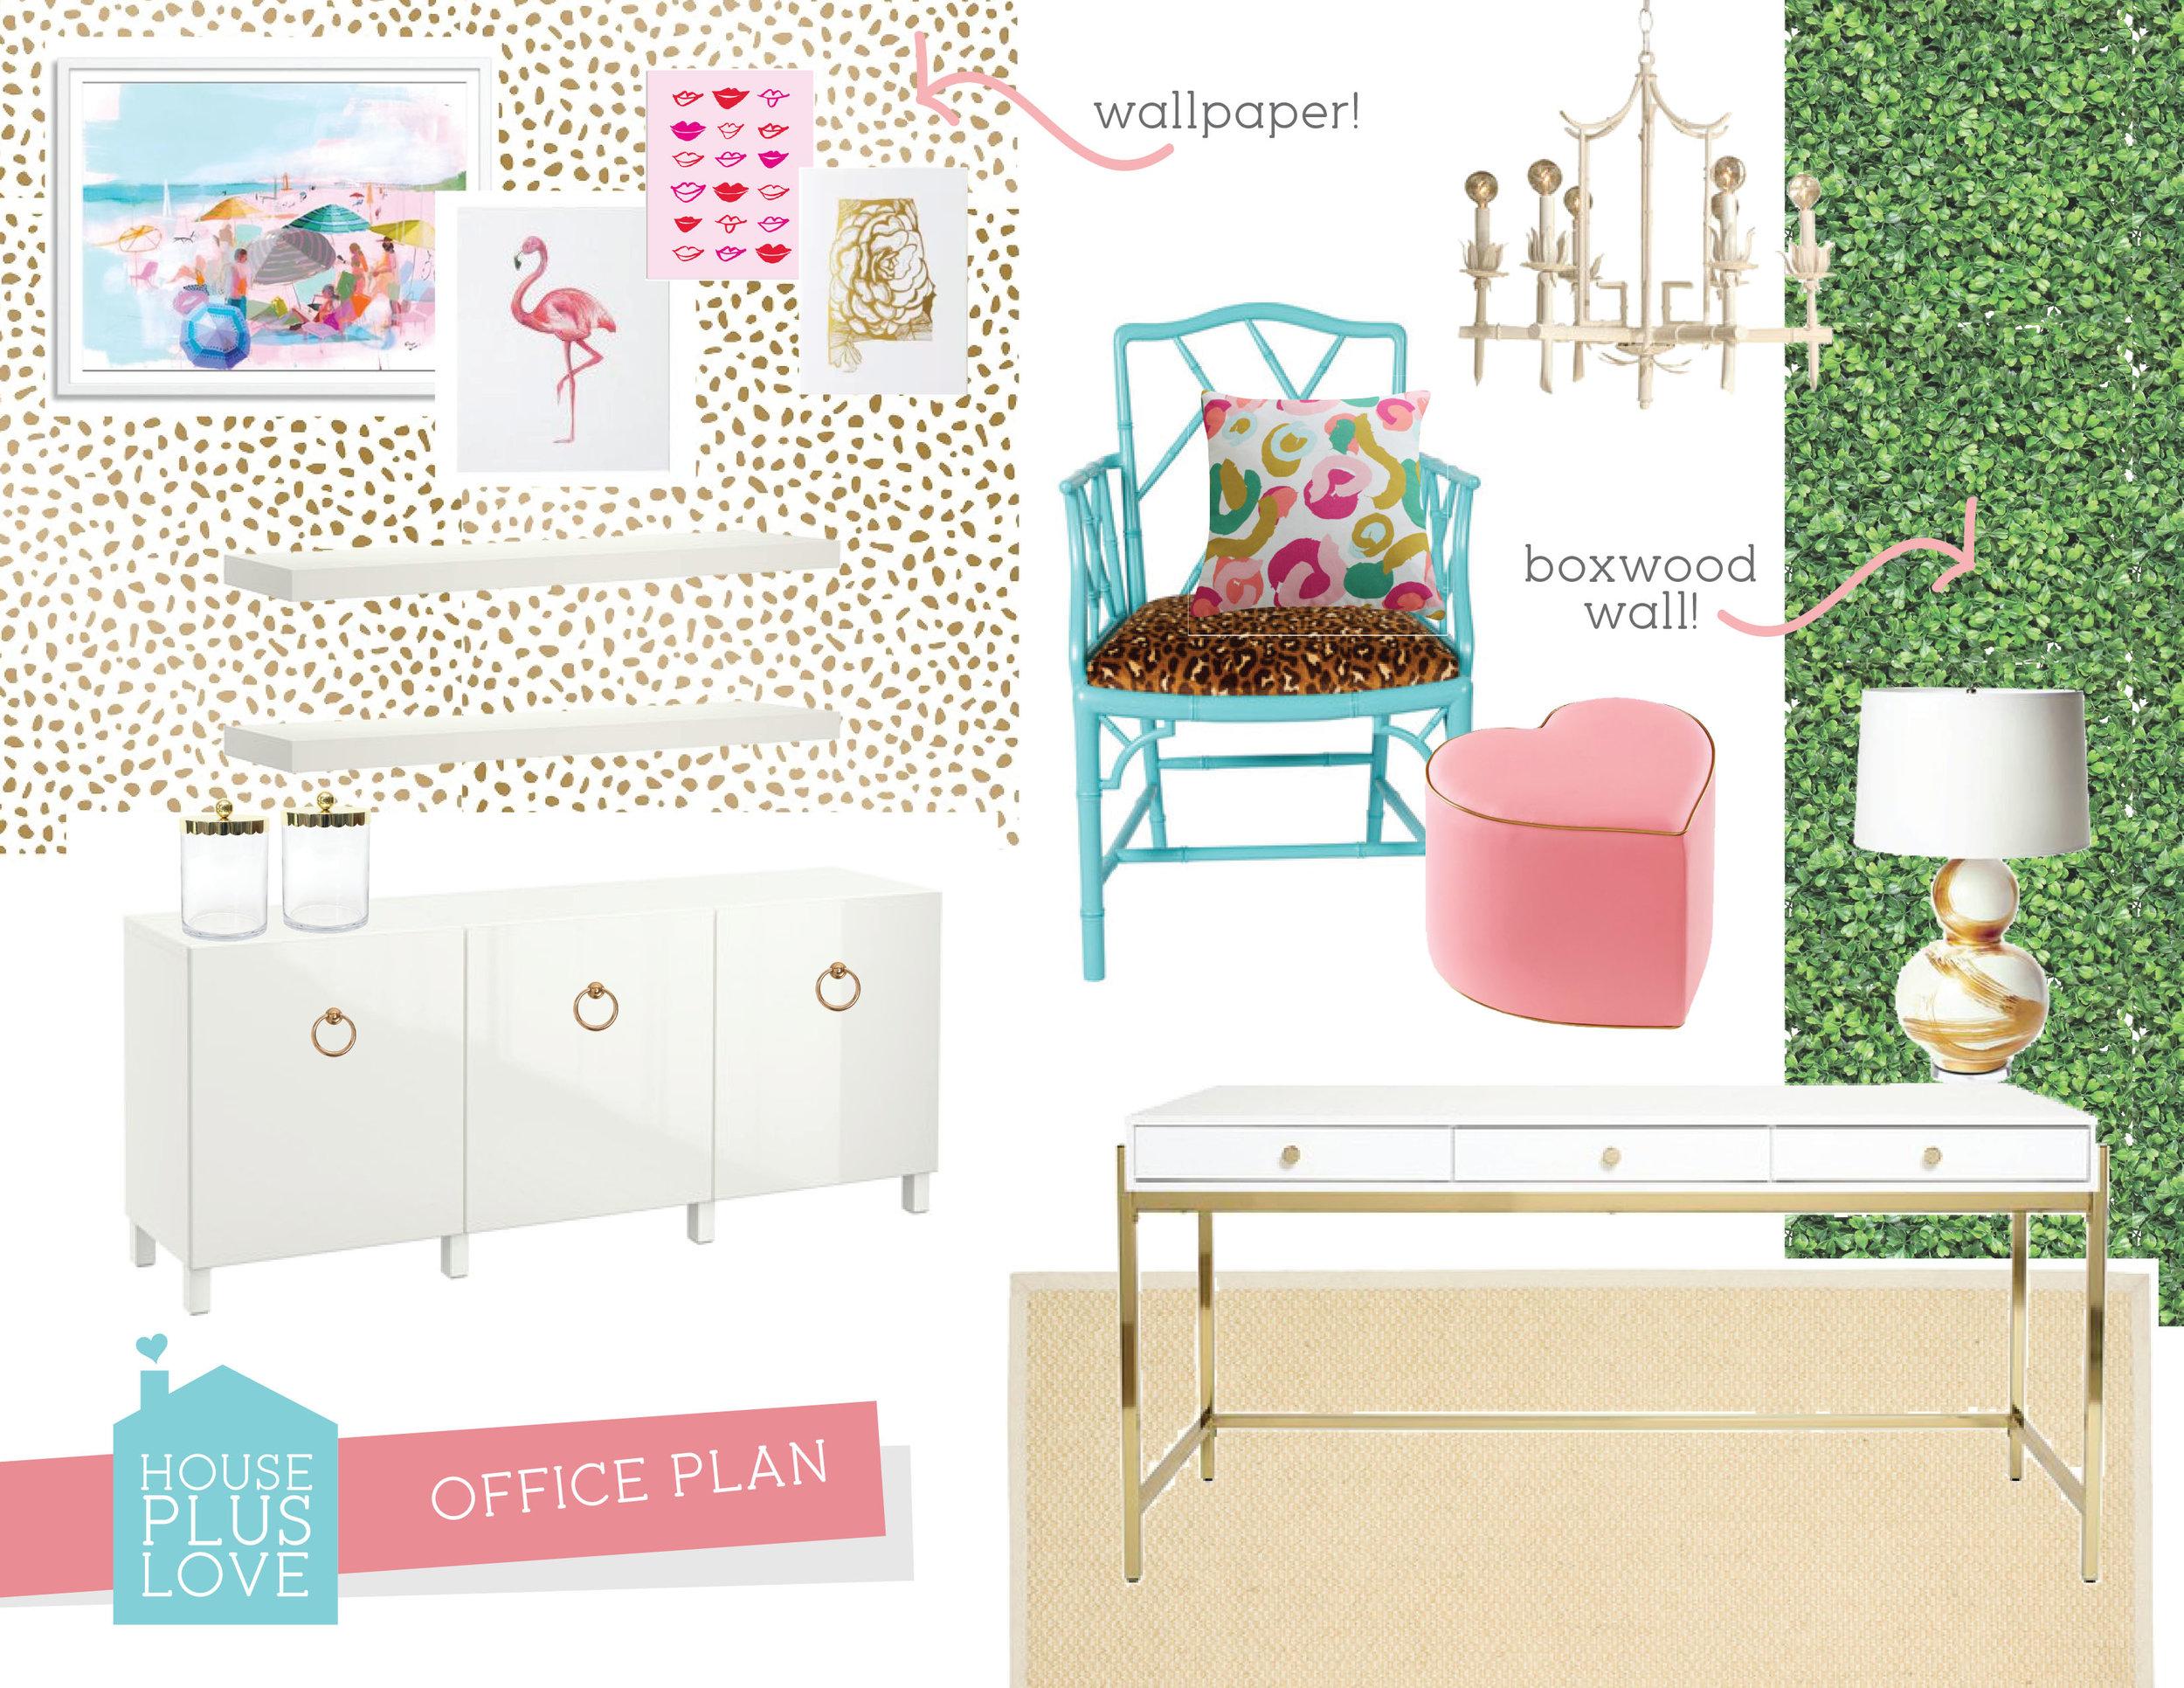 ORC House Plus Love Office Design Plan